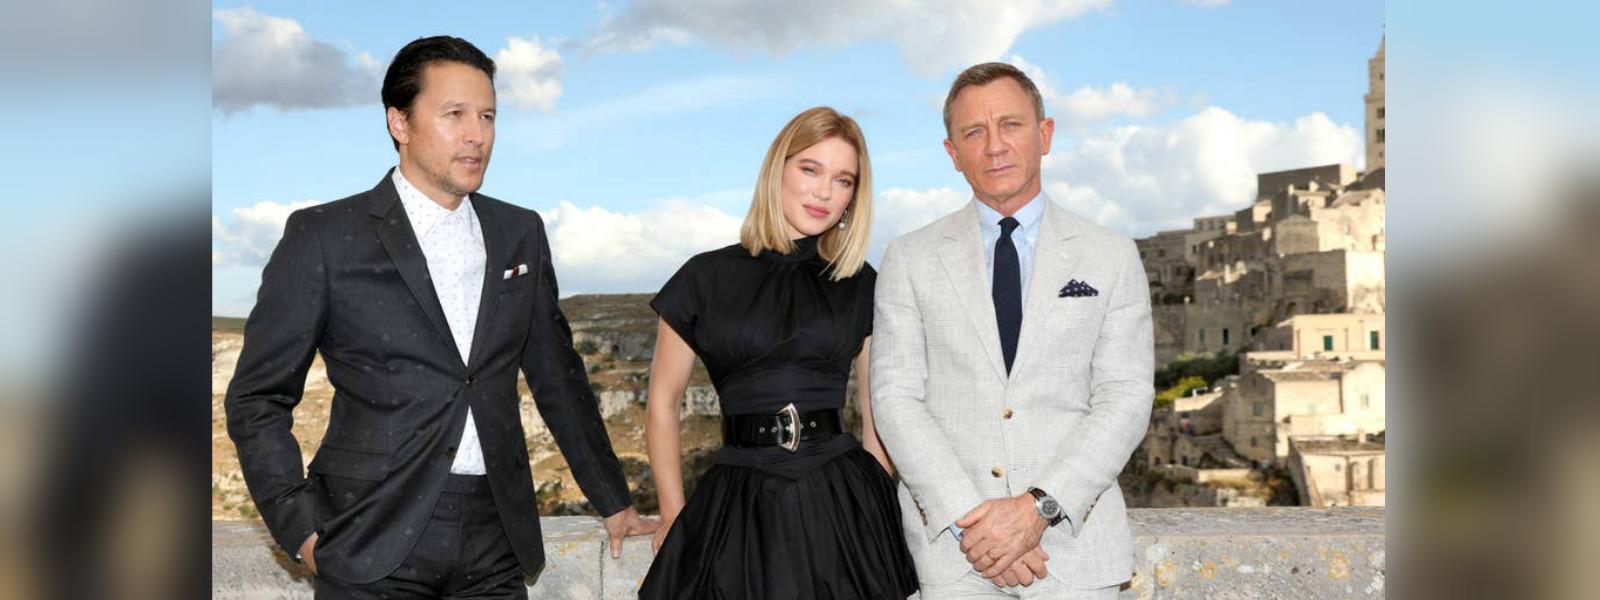 Daniel Craig arrives in Italy for new James Bond film